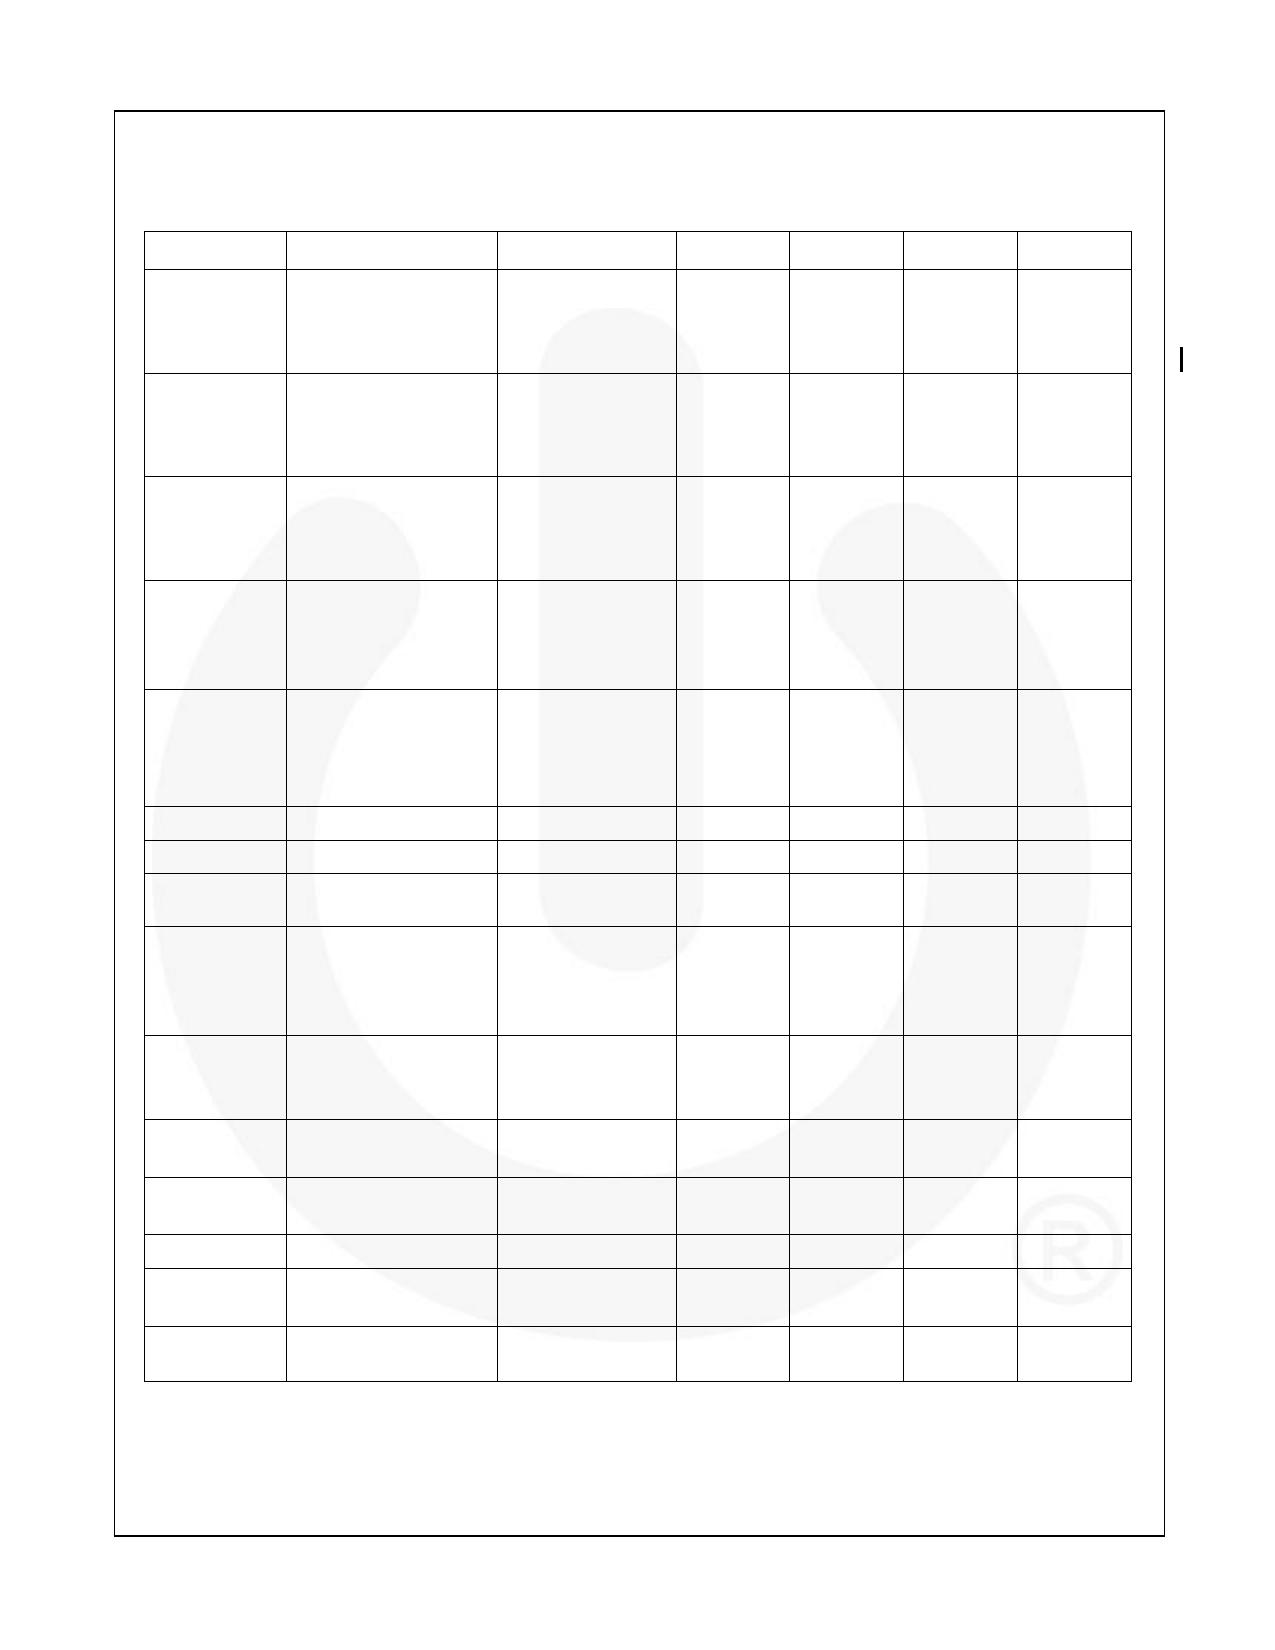 FGBS3040E1_F085 pdf, 반도체, 판매, 대치품